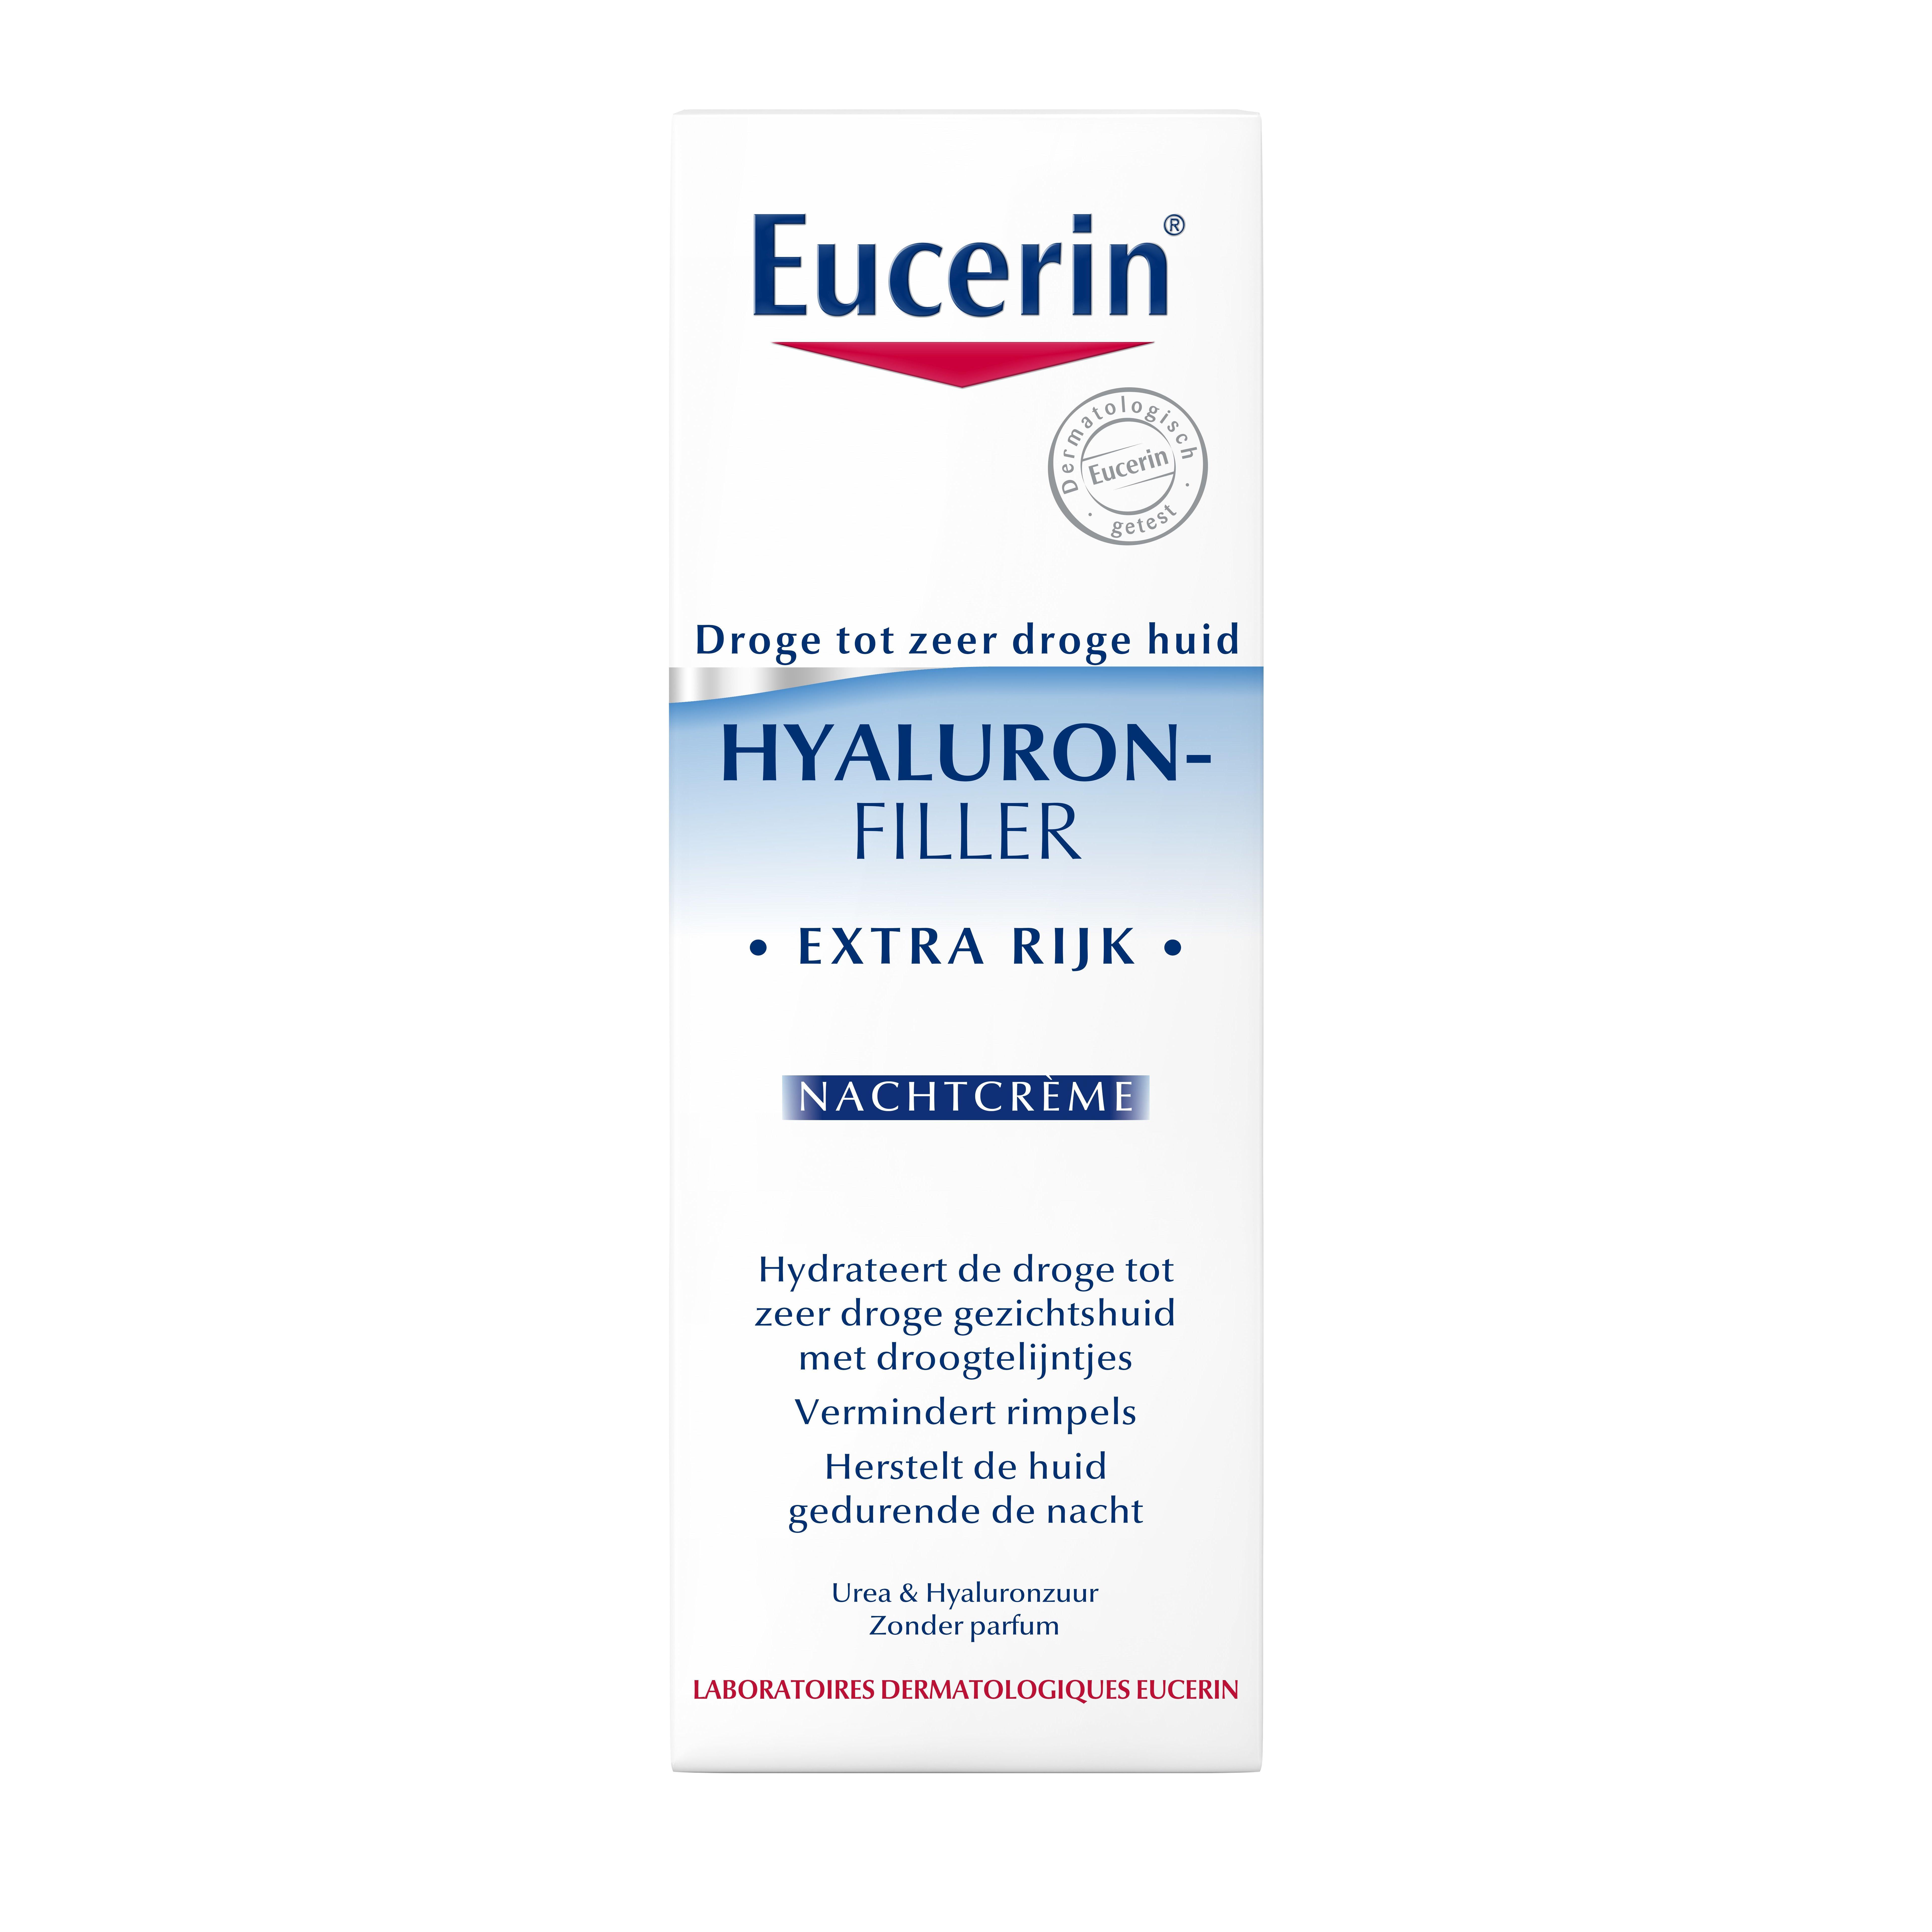 Eucerin Hyaluron-Filler Extra rijke nachtcrème